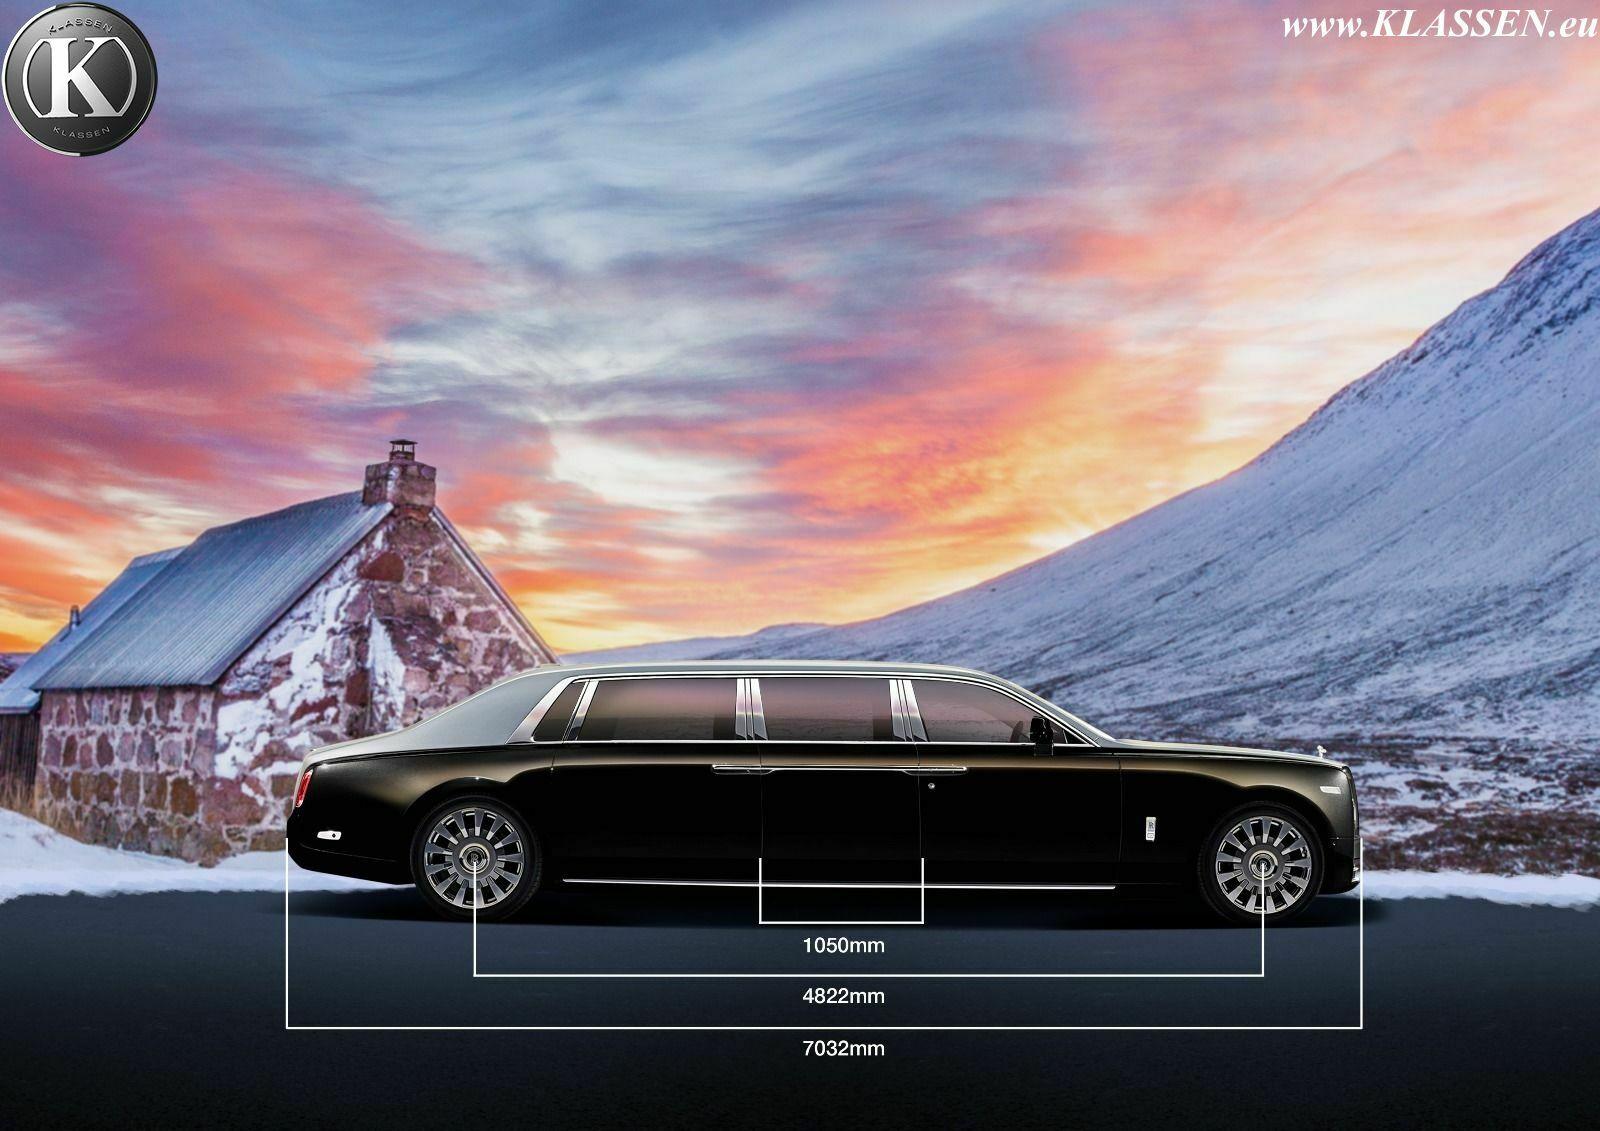 Rolls-Royce-Phantom-by-Klassen-6